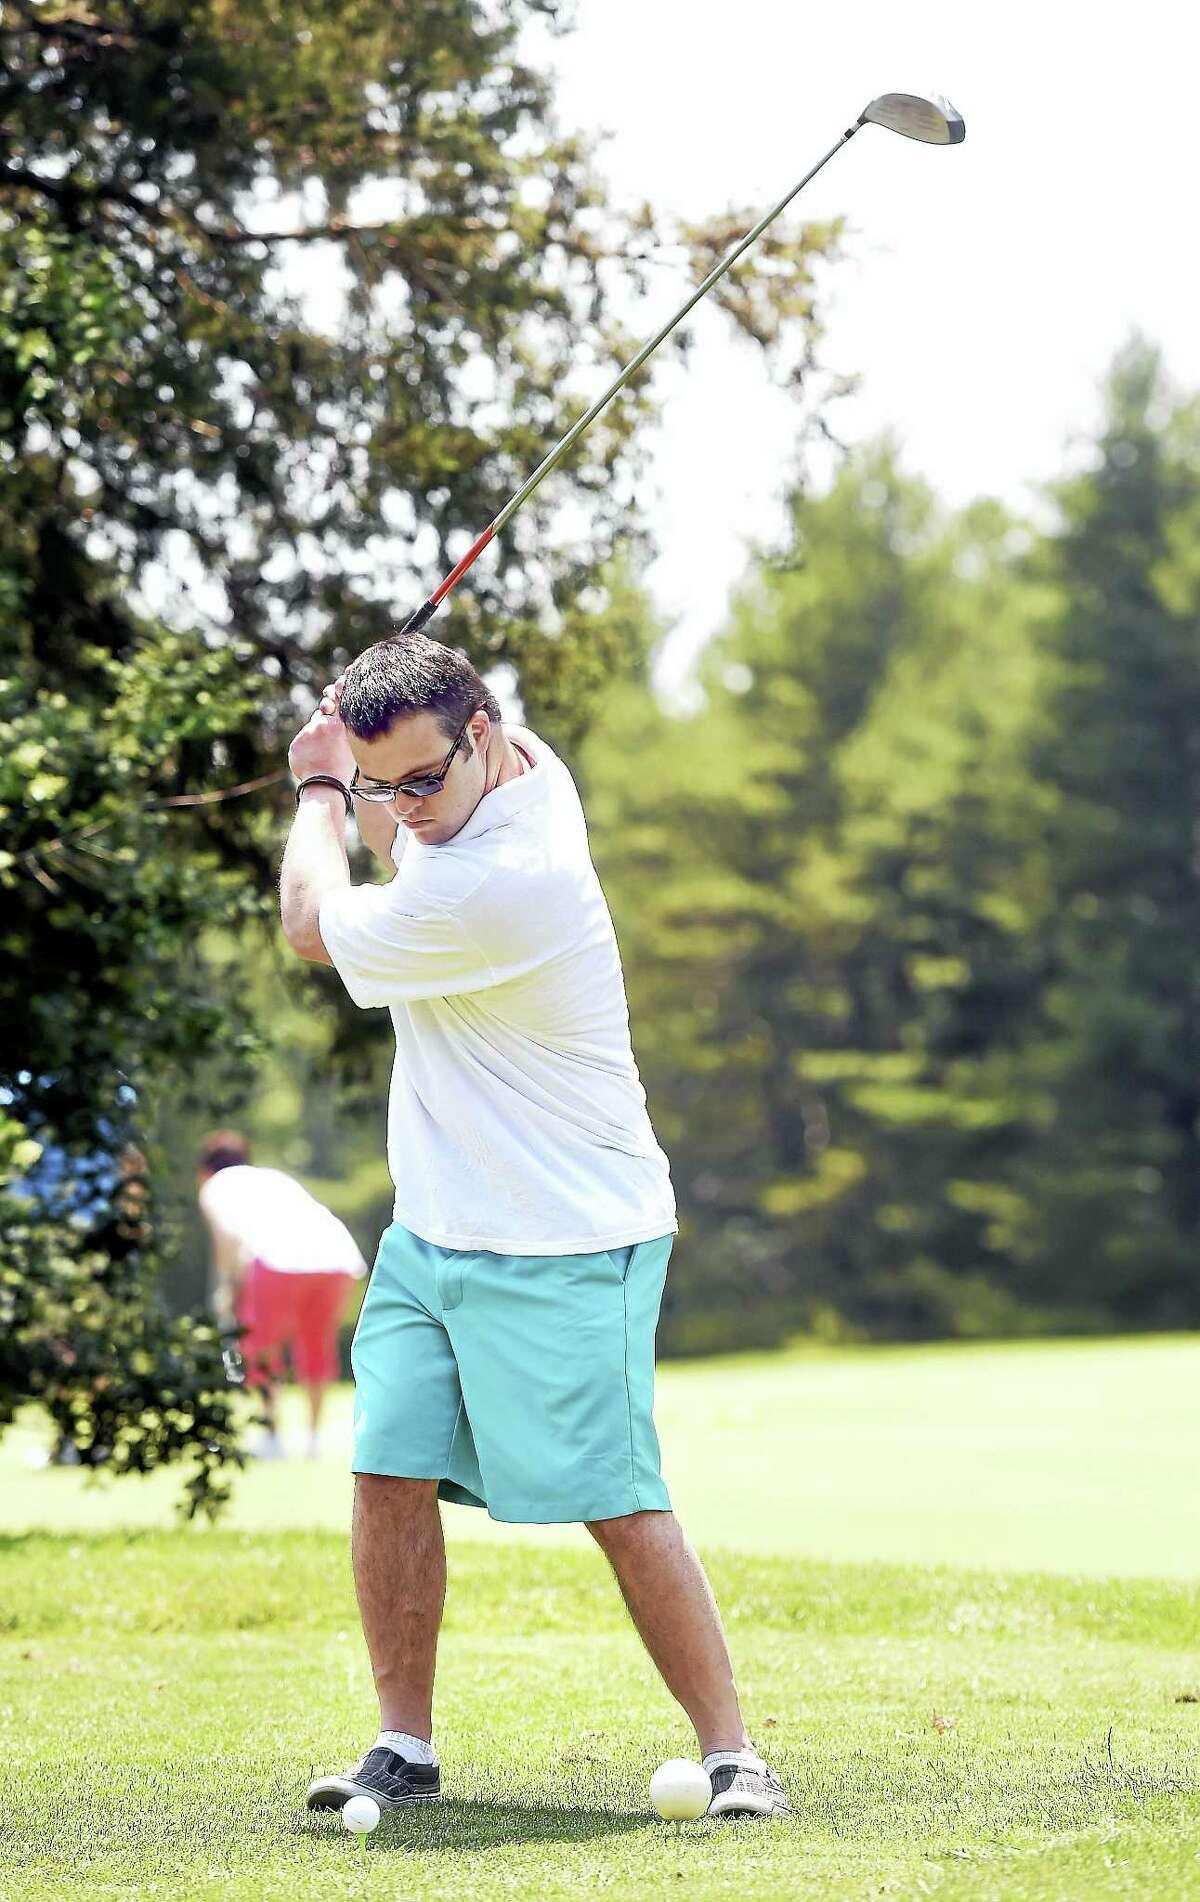 Sean Bogart of Hamden hits for Roy Garofalo on the third hole of the Mia Joseph Golf Tournament at the Country Club of Woodbridge Sunday.